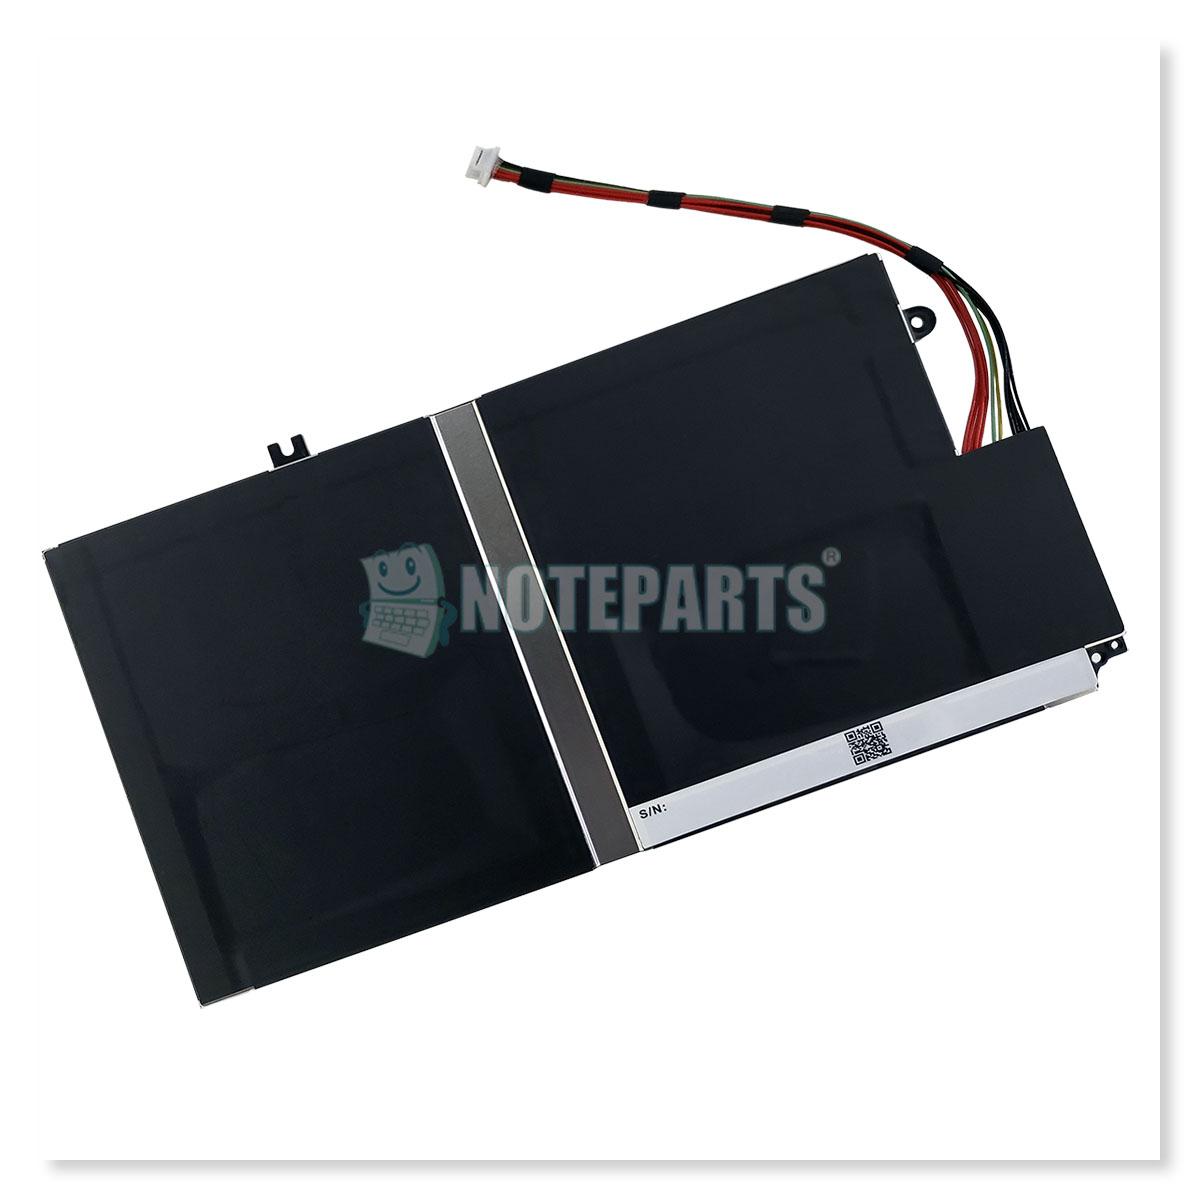 HP ENVY 4-1000 ENVY TouchSmart Ultrabook 4-1100 4-1200 バッテリー EL04XL対応